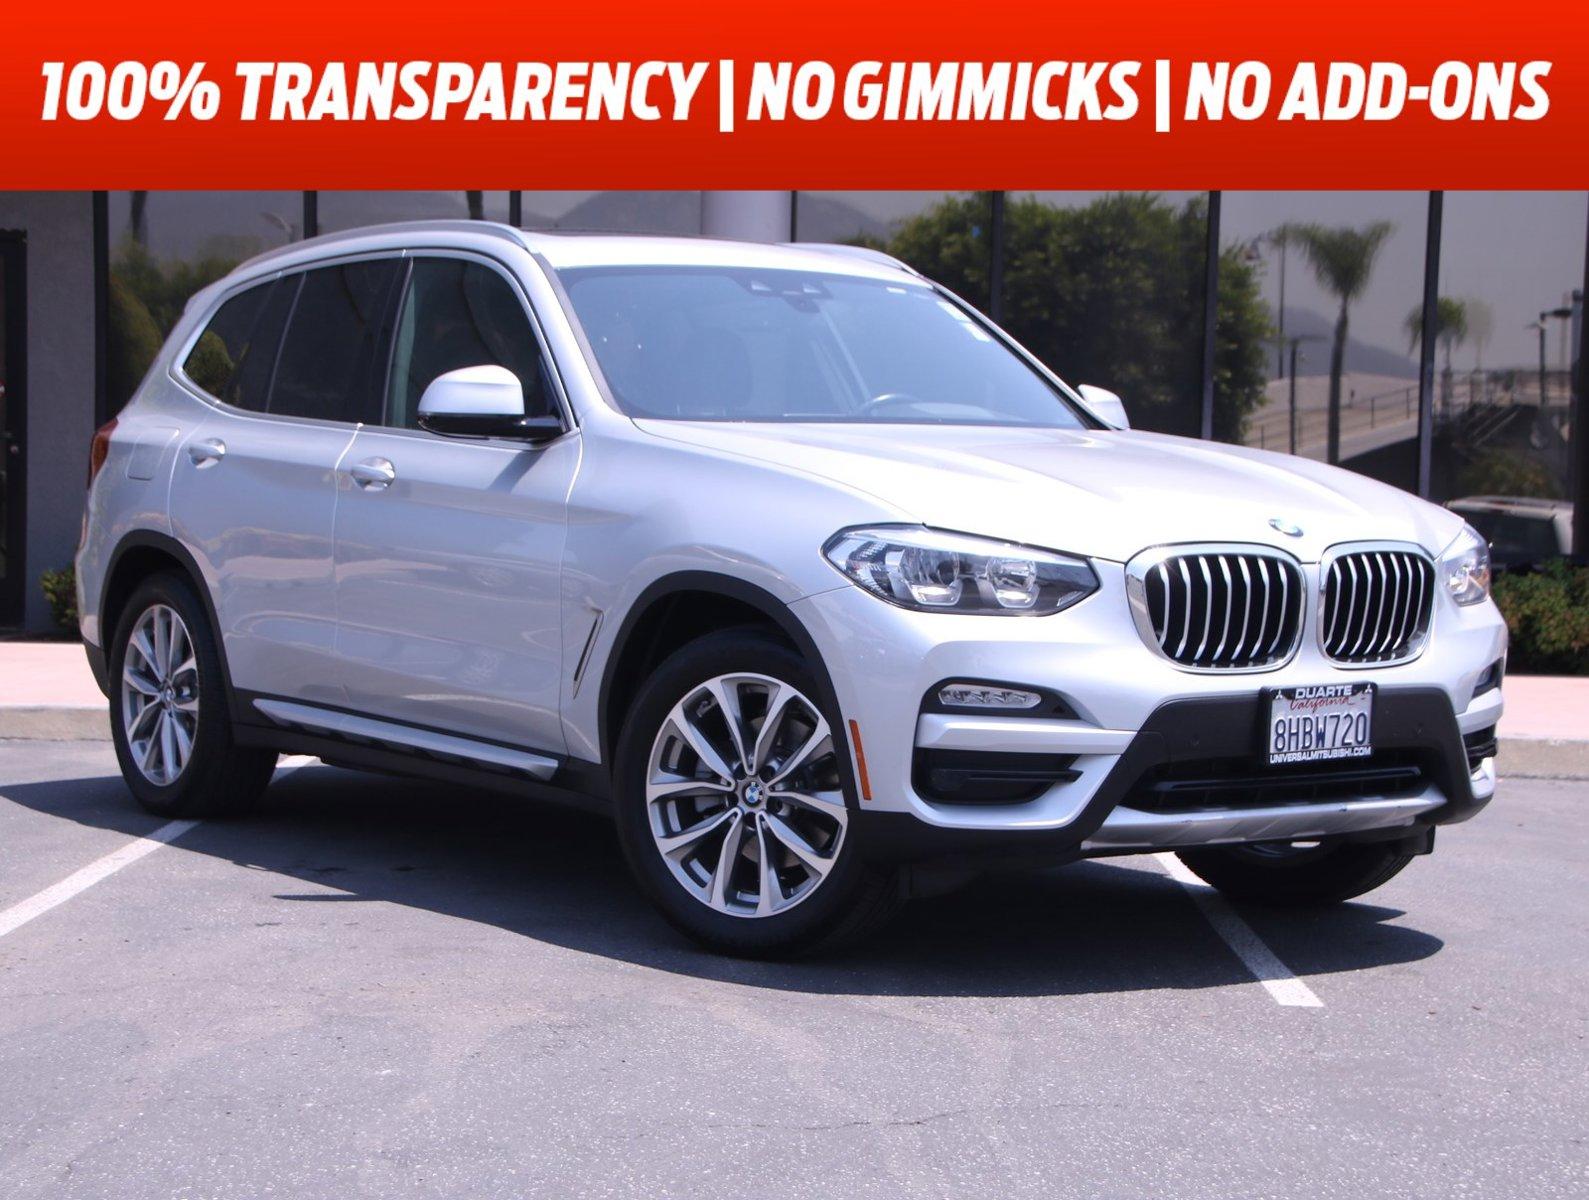 2019 BMW X3 sDrive30i sDrive30i Sports Activity Vehicle Intercooled Turbo Premium Unleaded I-4 2.0 L/122 [2]